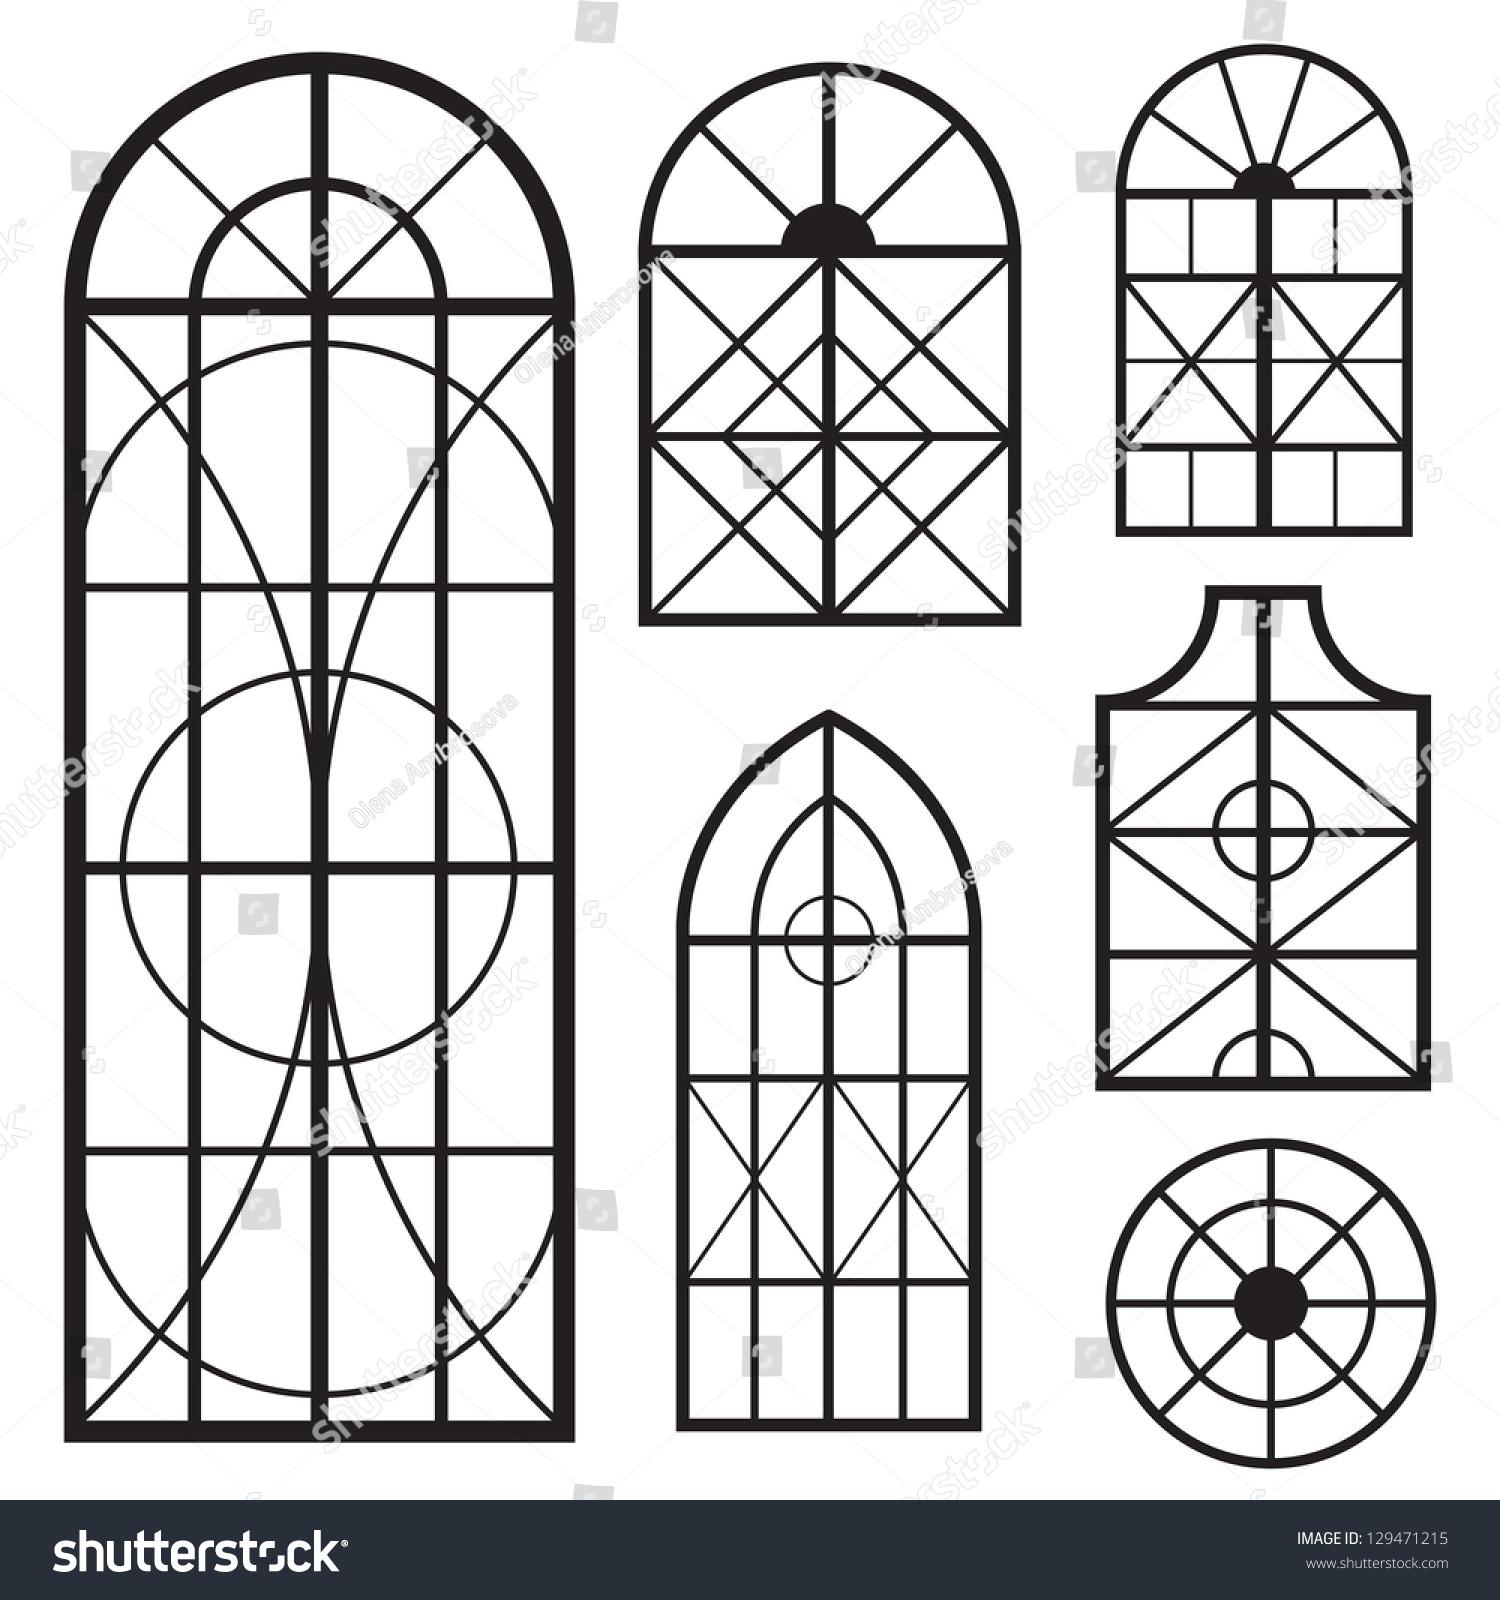 Set Various Window Shapes Stock Vector 129471215 - Shutterstock